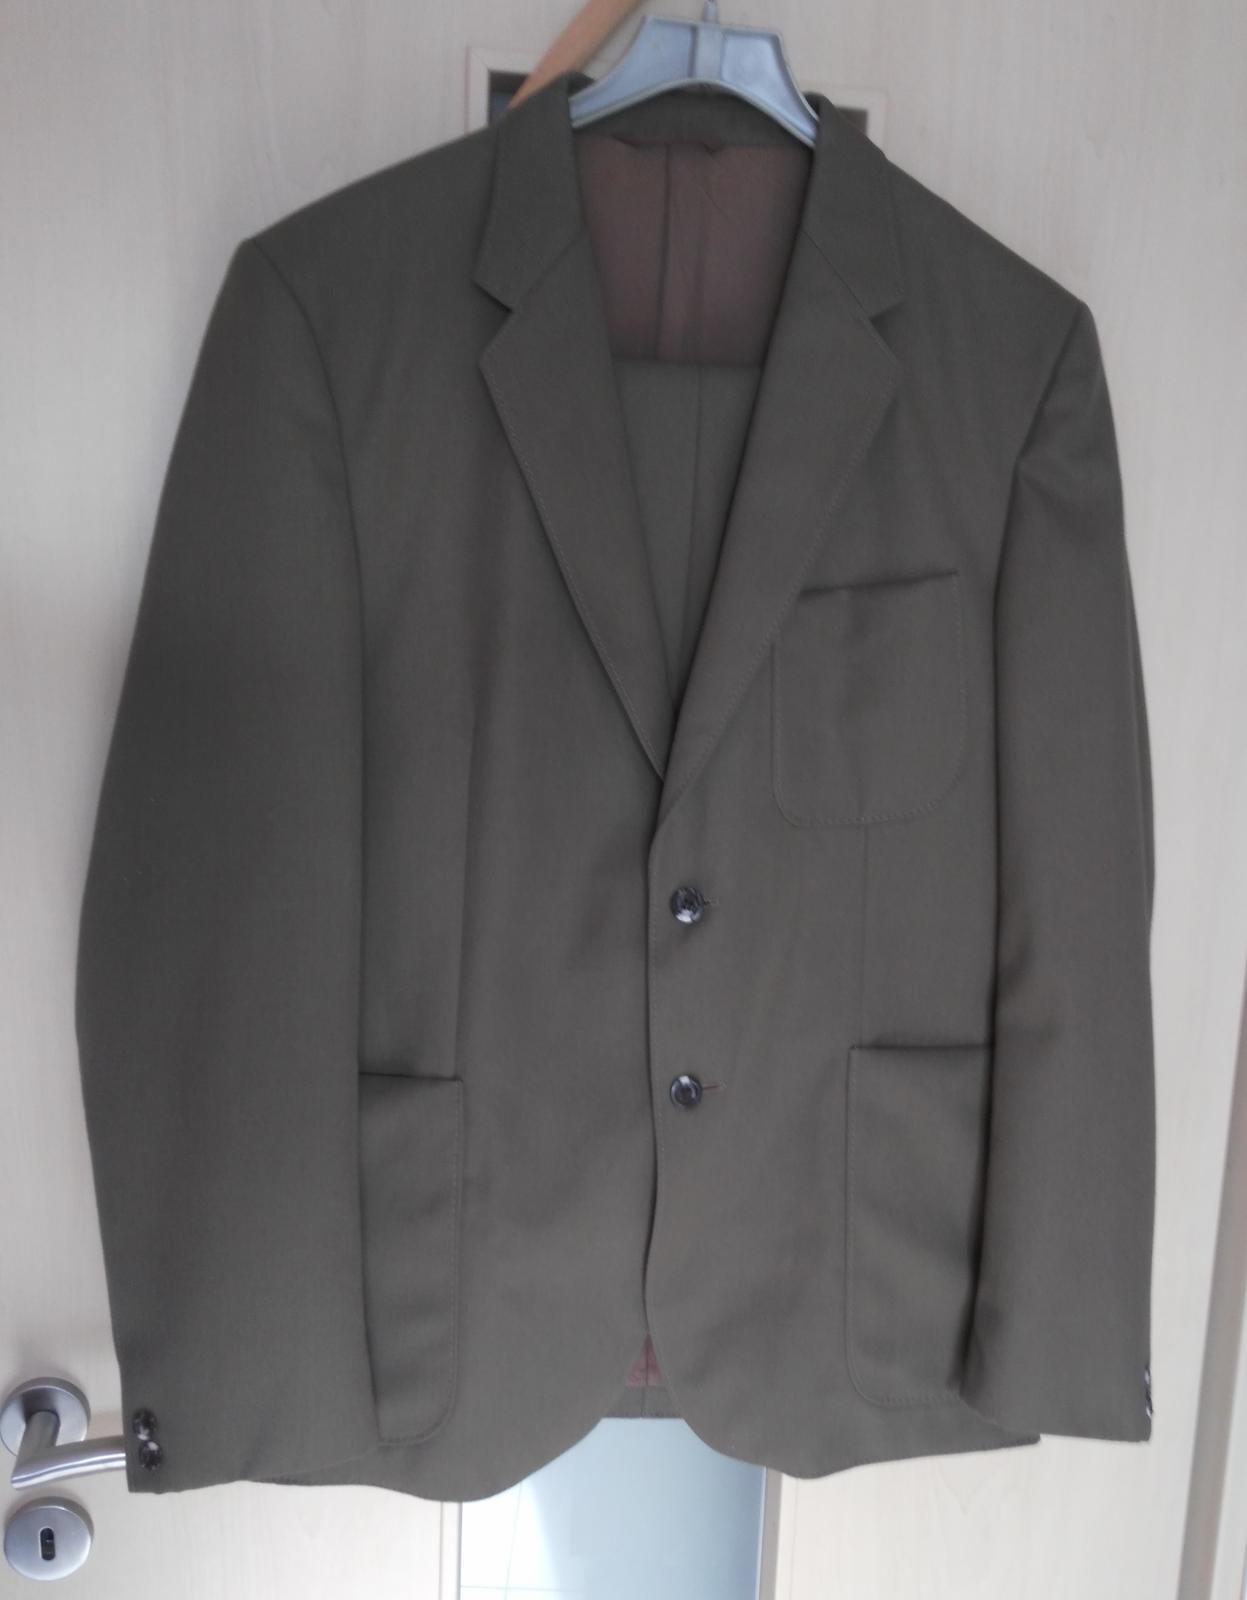 Hnedo-khaki oblek č.52 - Obrázok č. 1